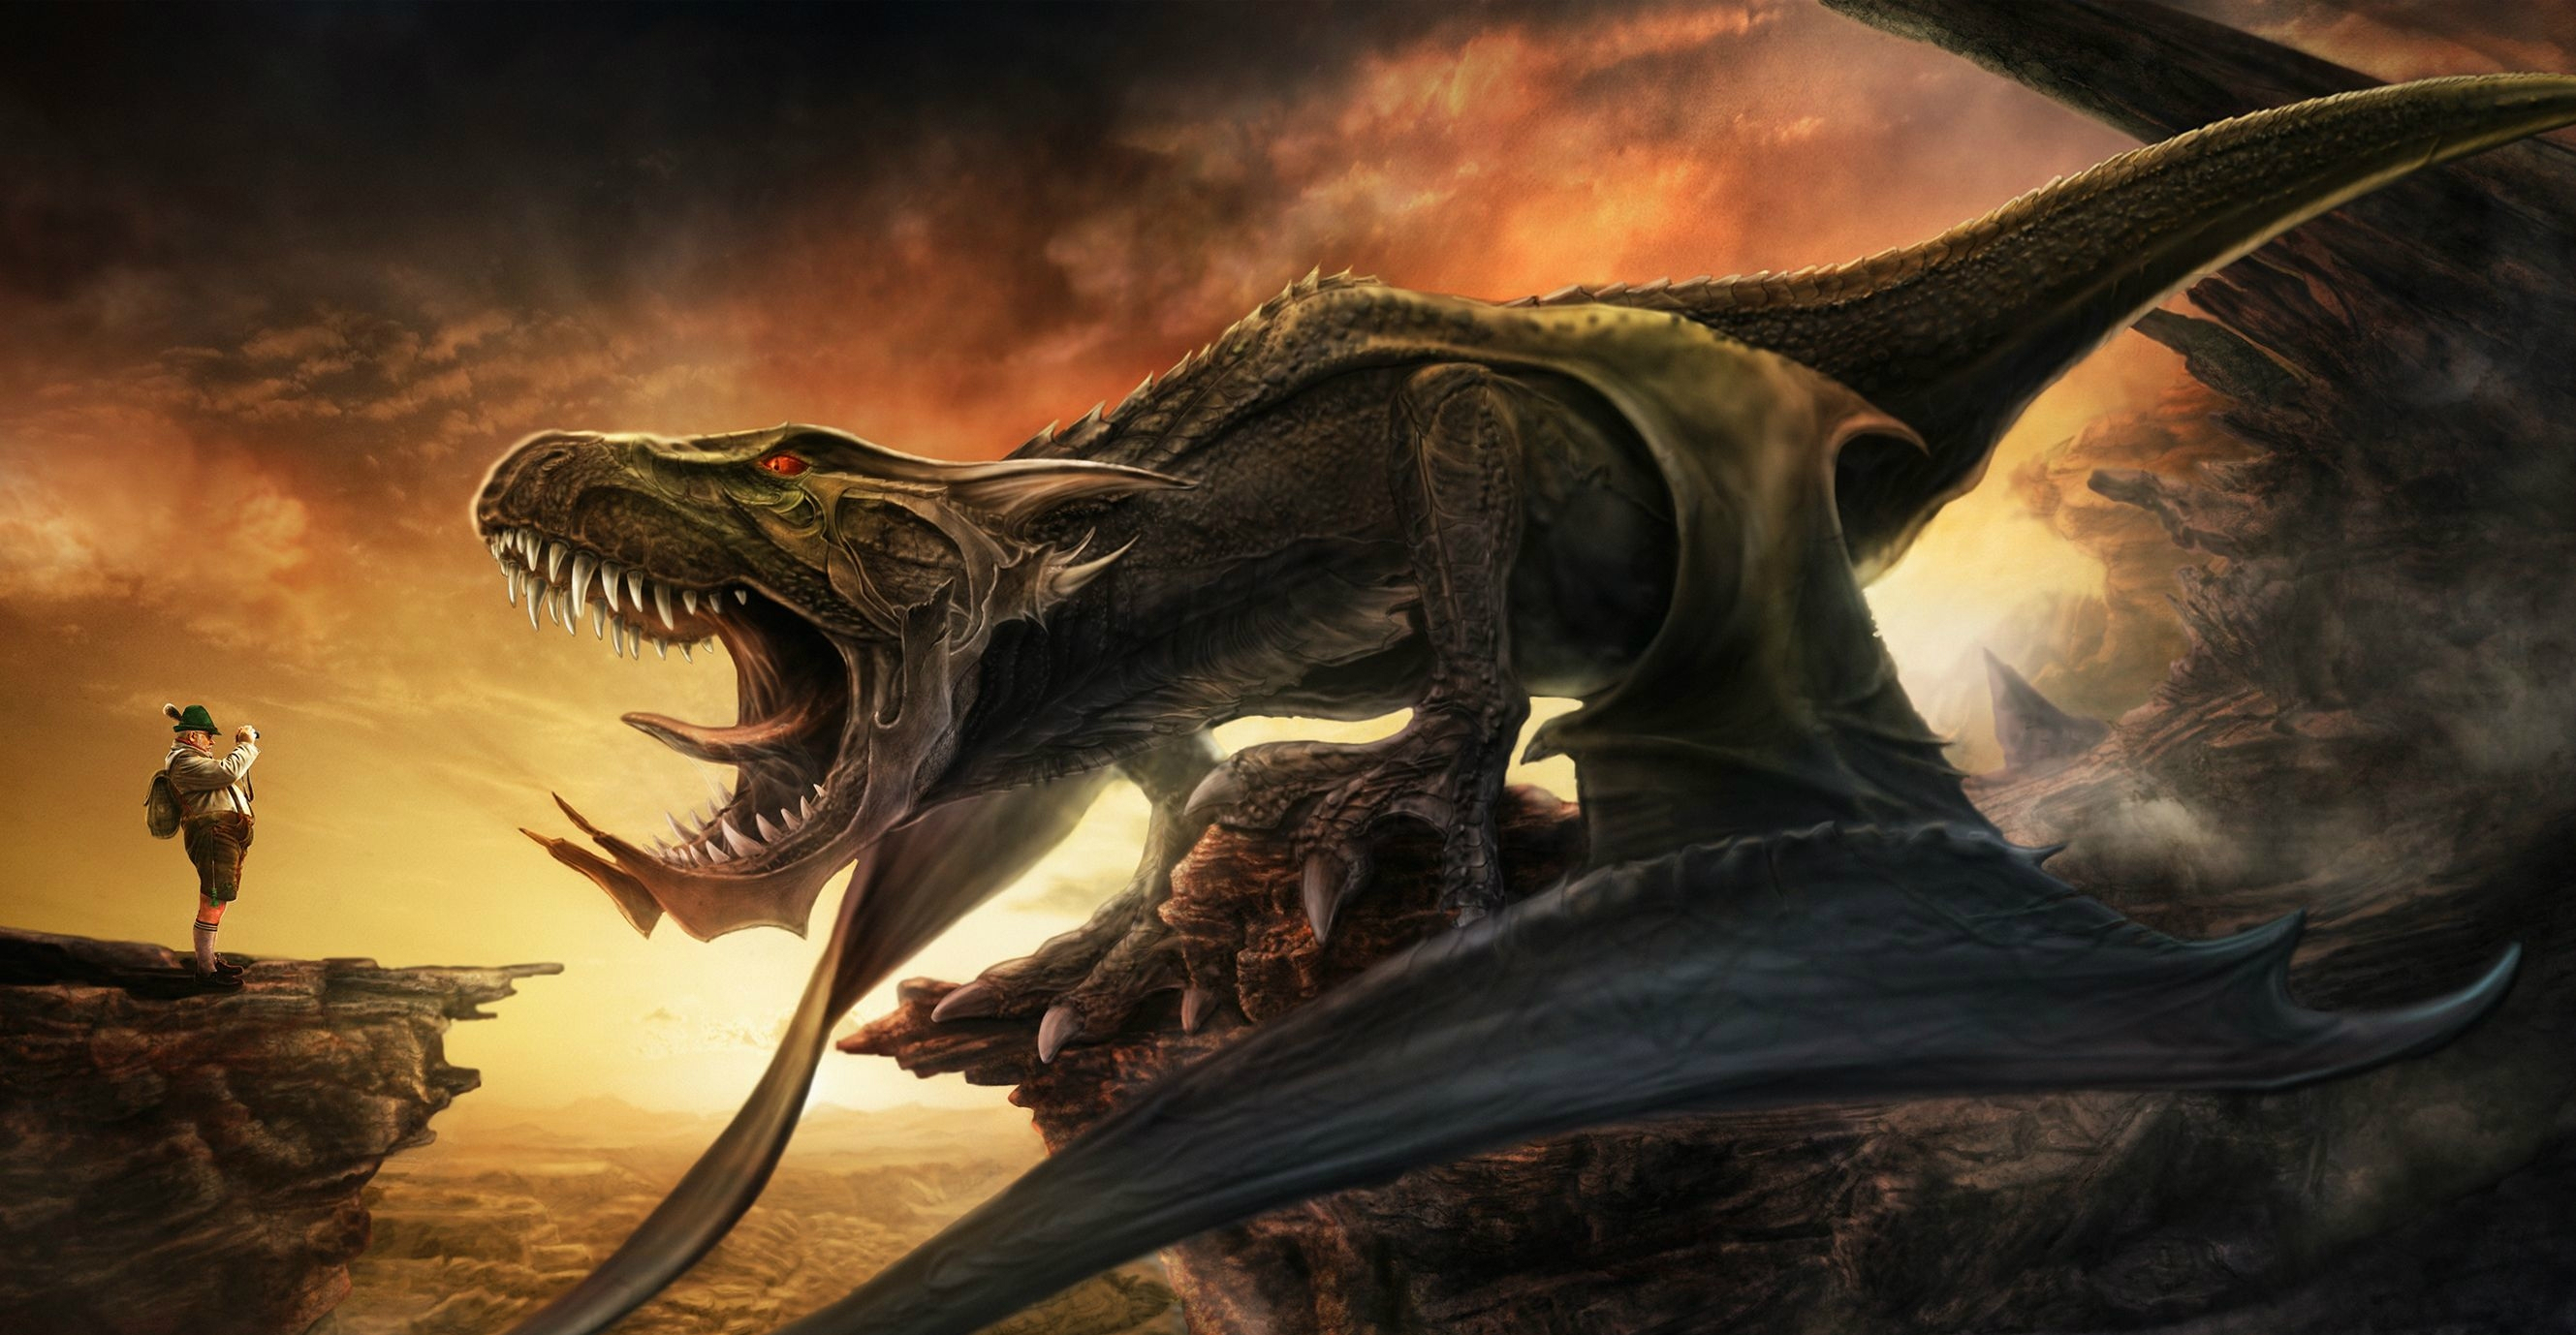 Download Dinosaur Wallpaper 2658x1378 Full HD Wallpapers 2658x1378